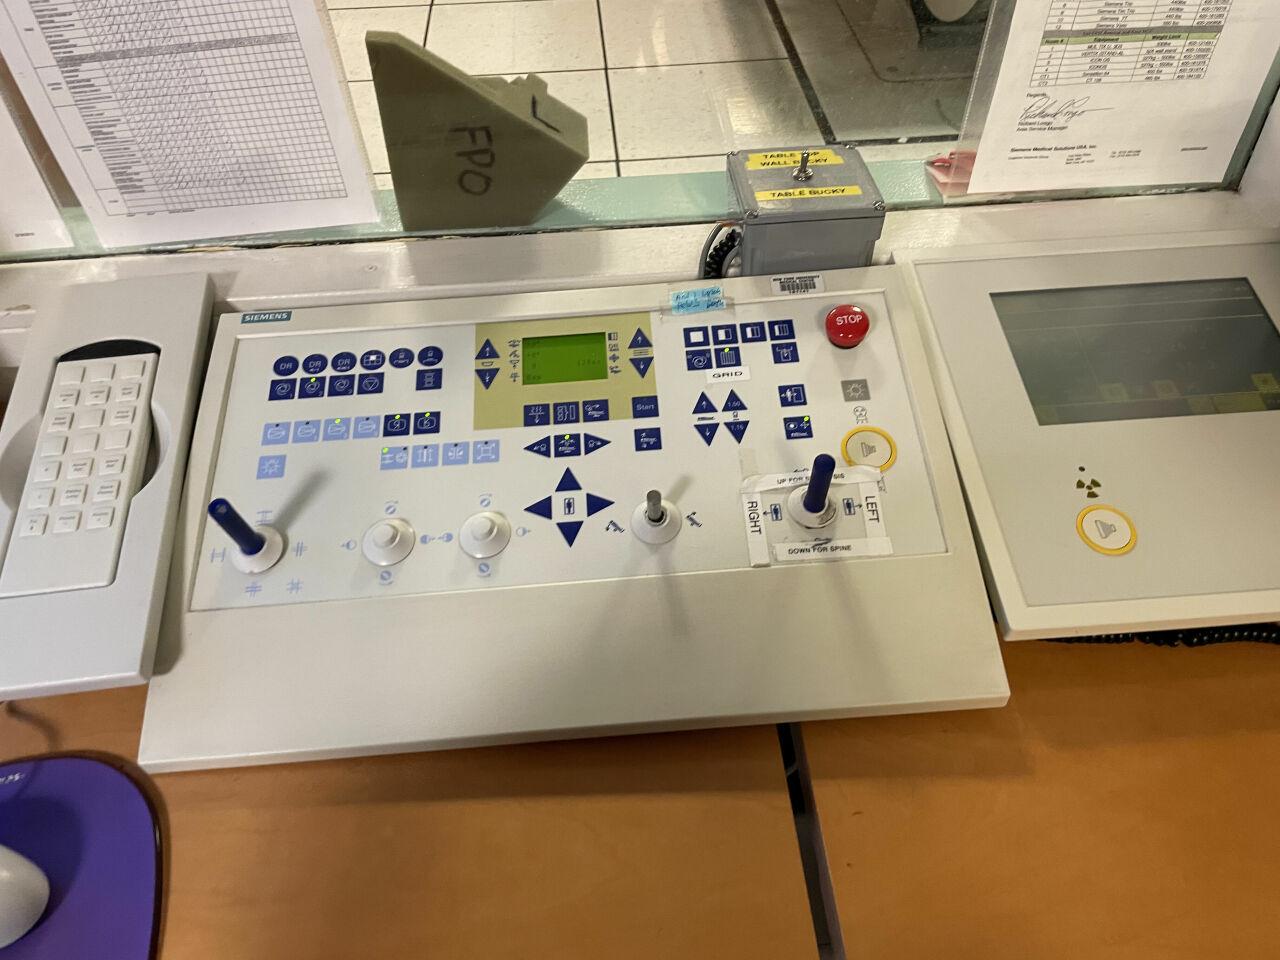 SIEMENS Axiom Iconos R200 Polydorus SX 65 generator Remote R/F Room